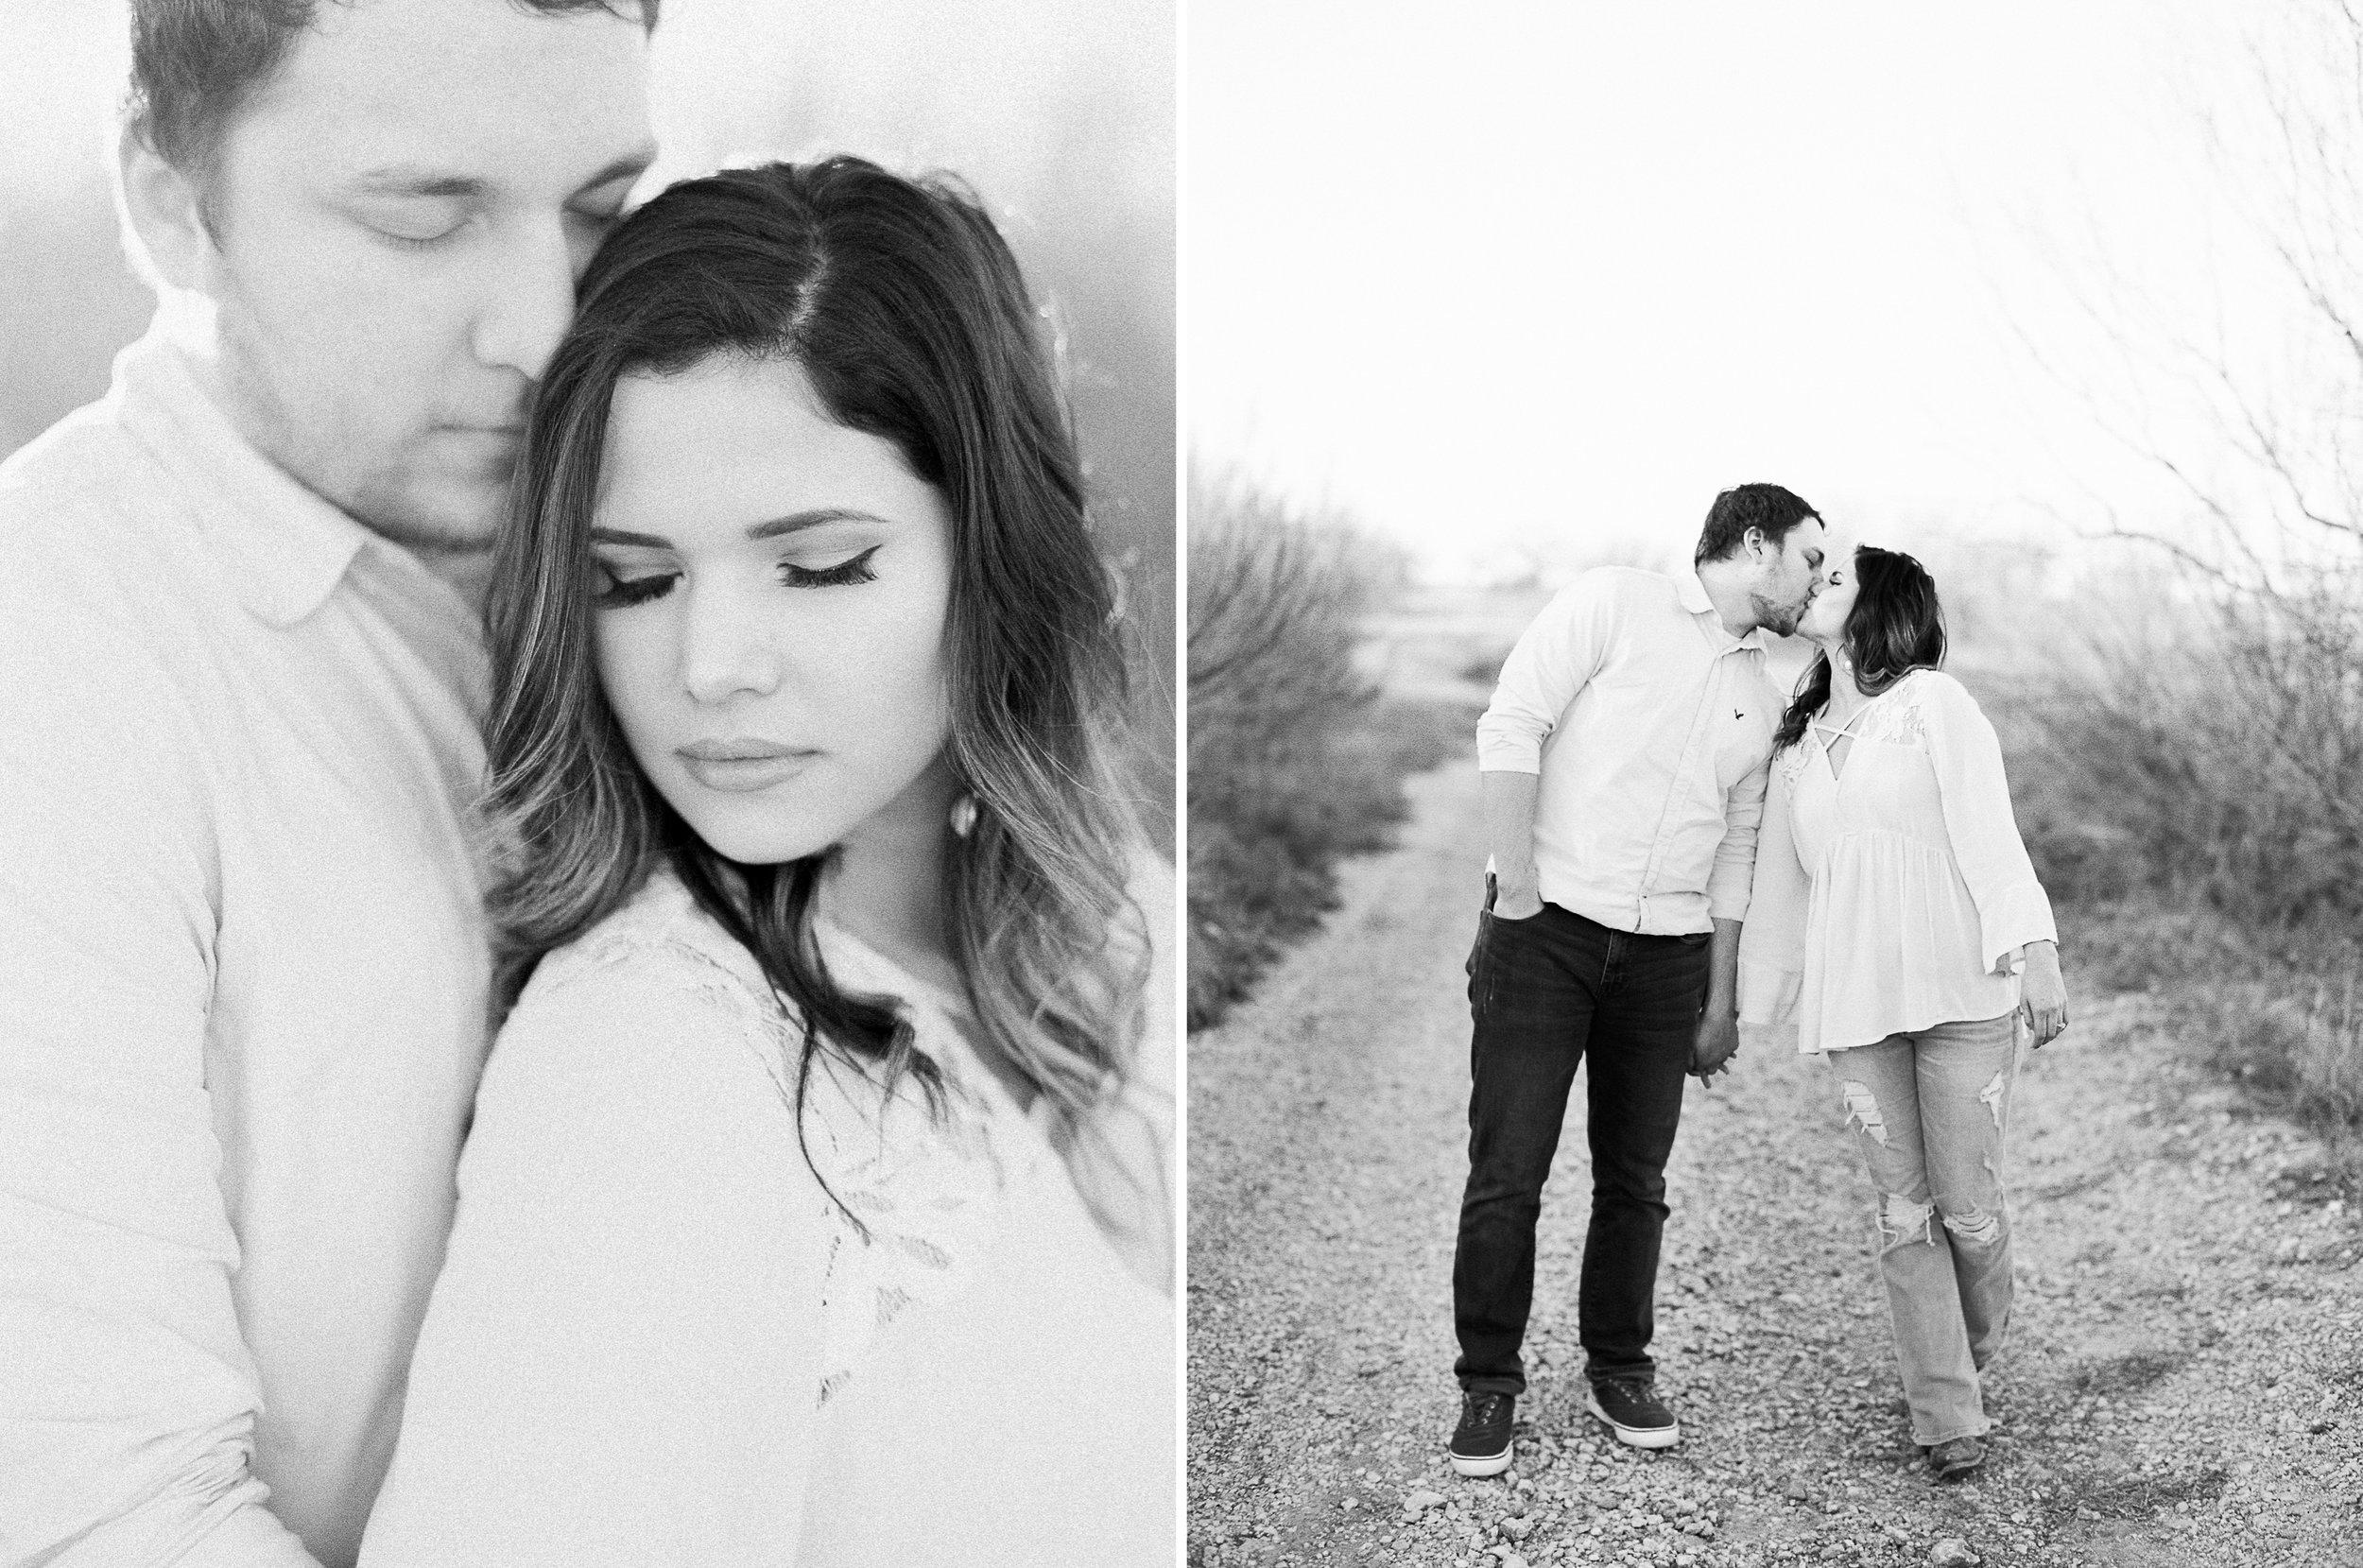 Daven & Meg | West Texas Engagement Session | Texas Wedding Photographer | Britni Dean Photography | britnidean.com